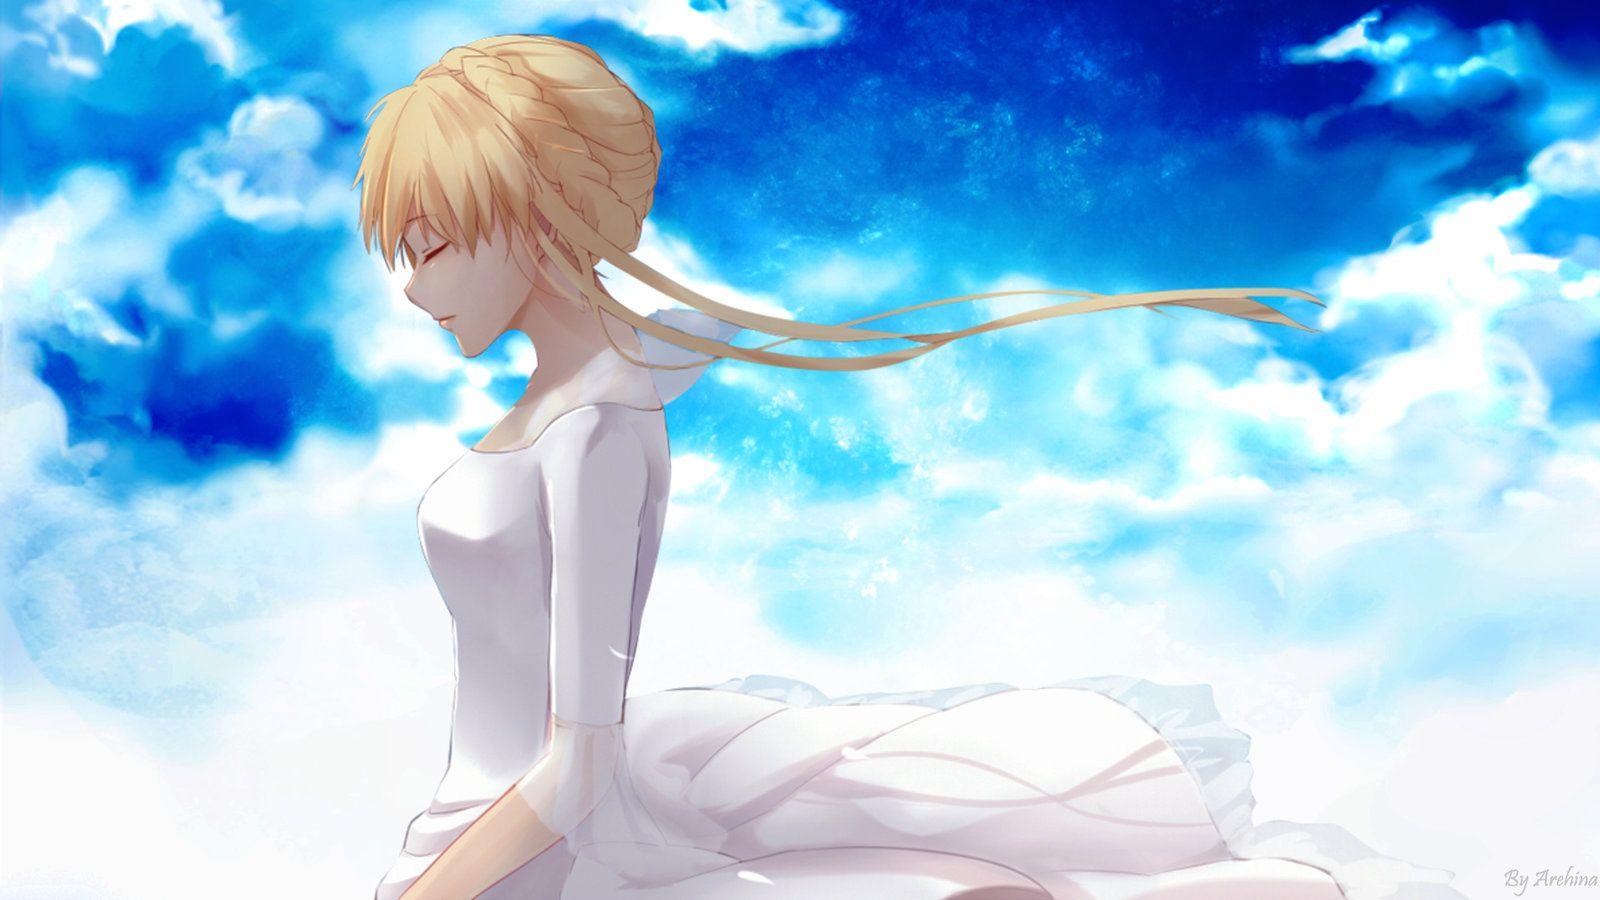 Princess Asseylum Anime Love Anime Awesome Anime